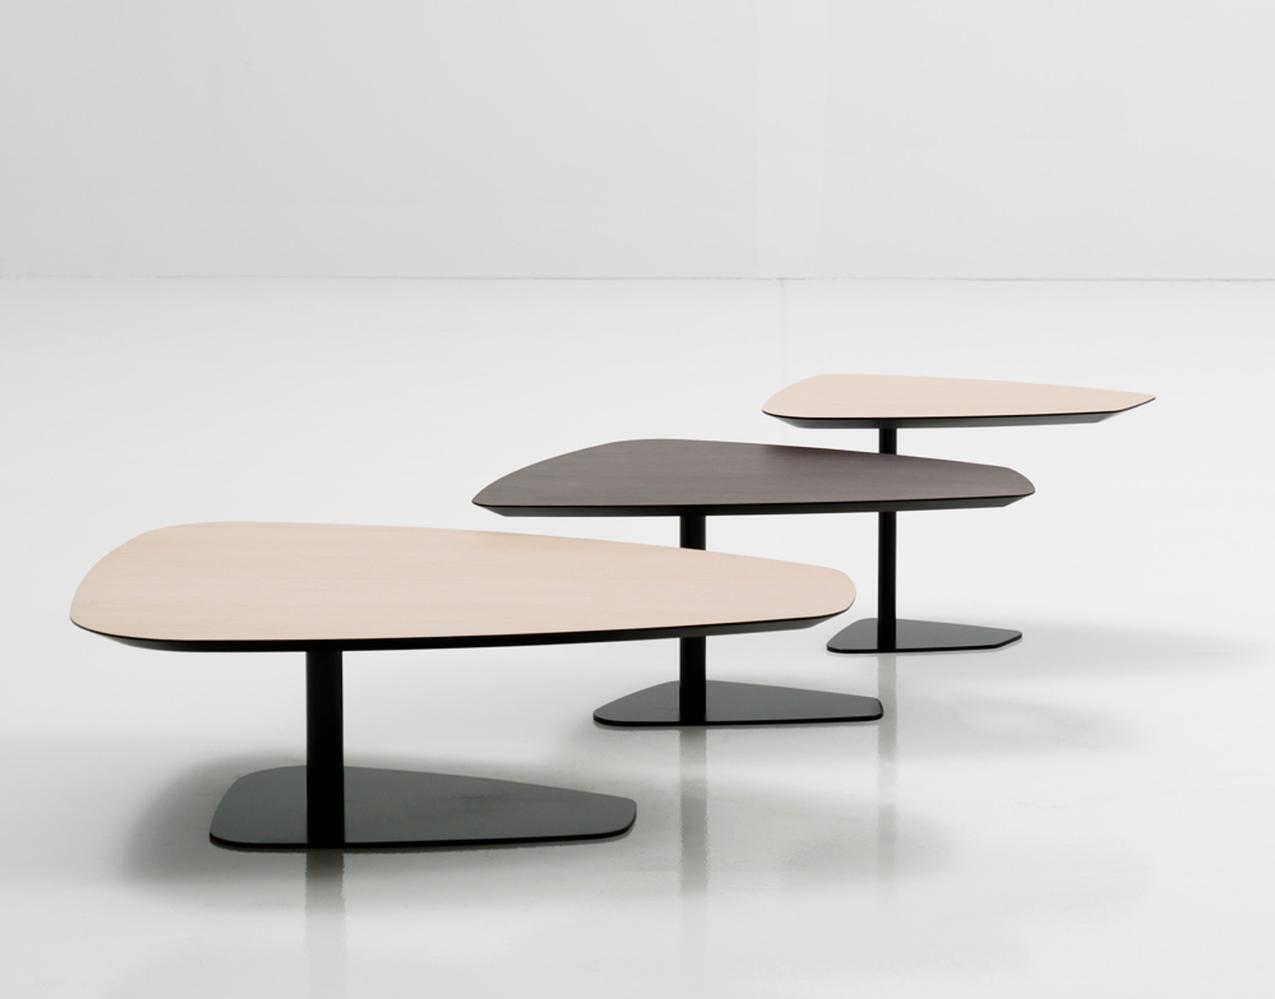 Rock table sancal rafa garcia f tables table furniture